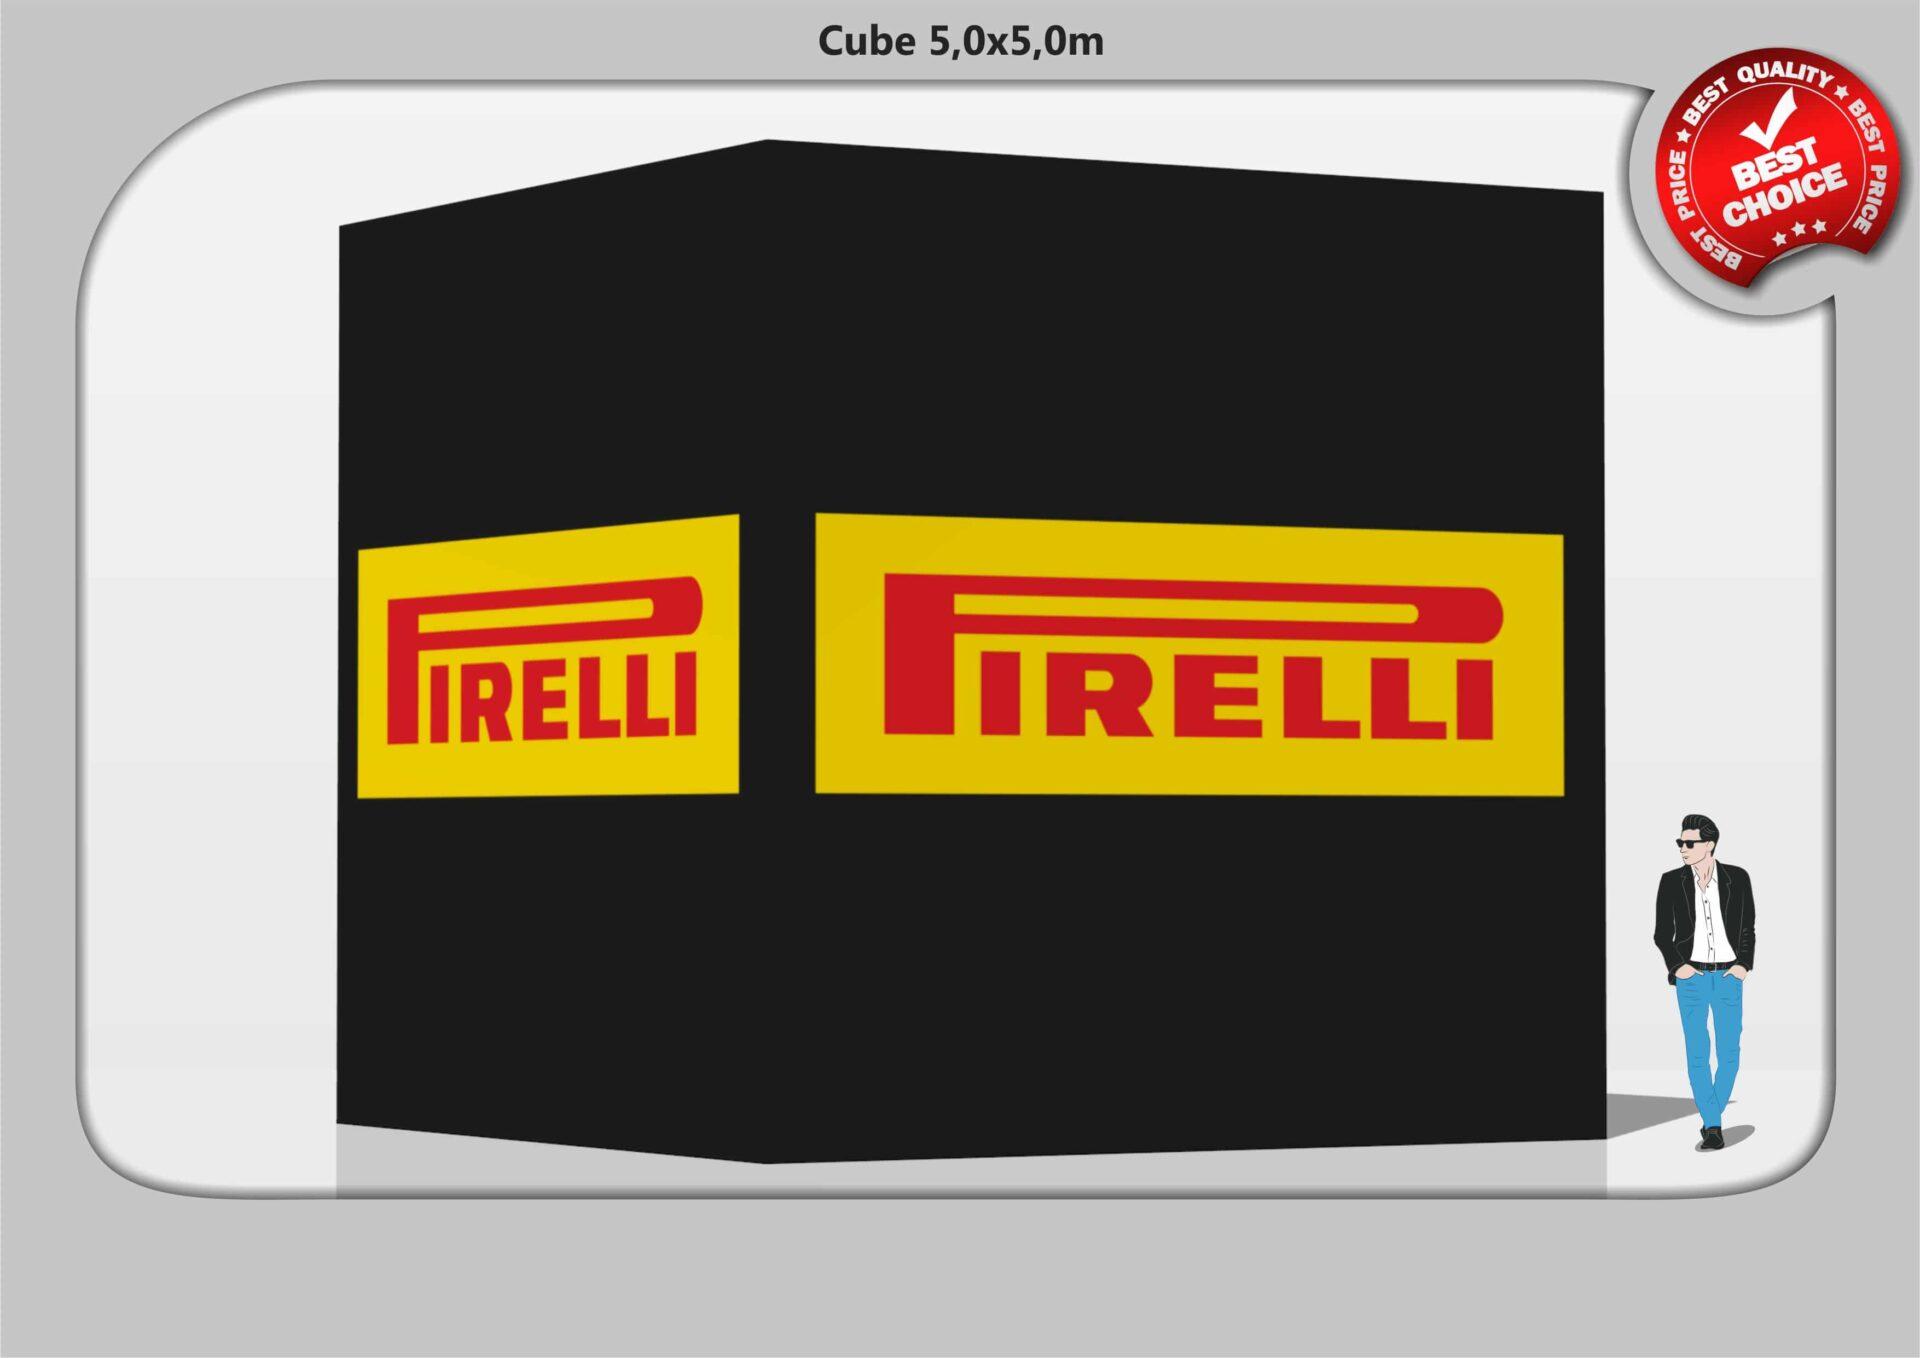 würfel-pirelli-aufblasbar